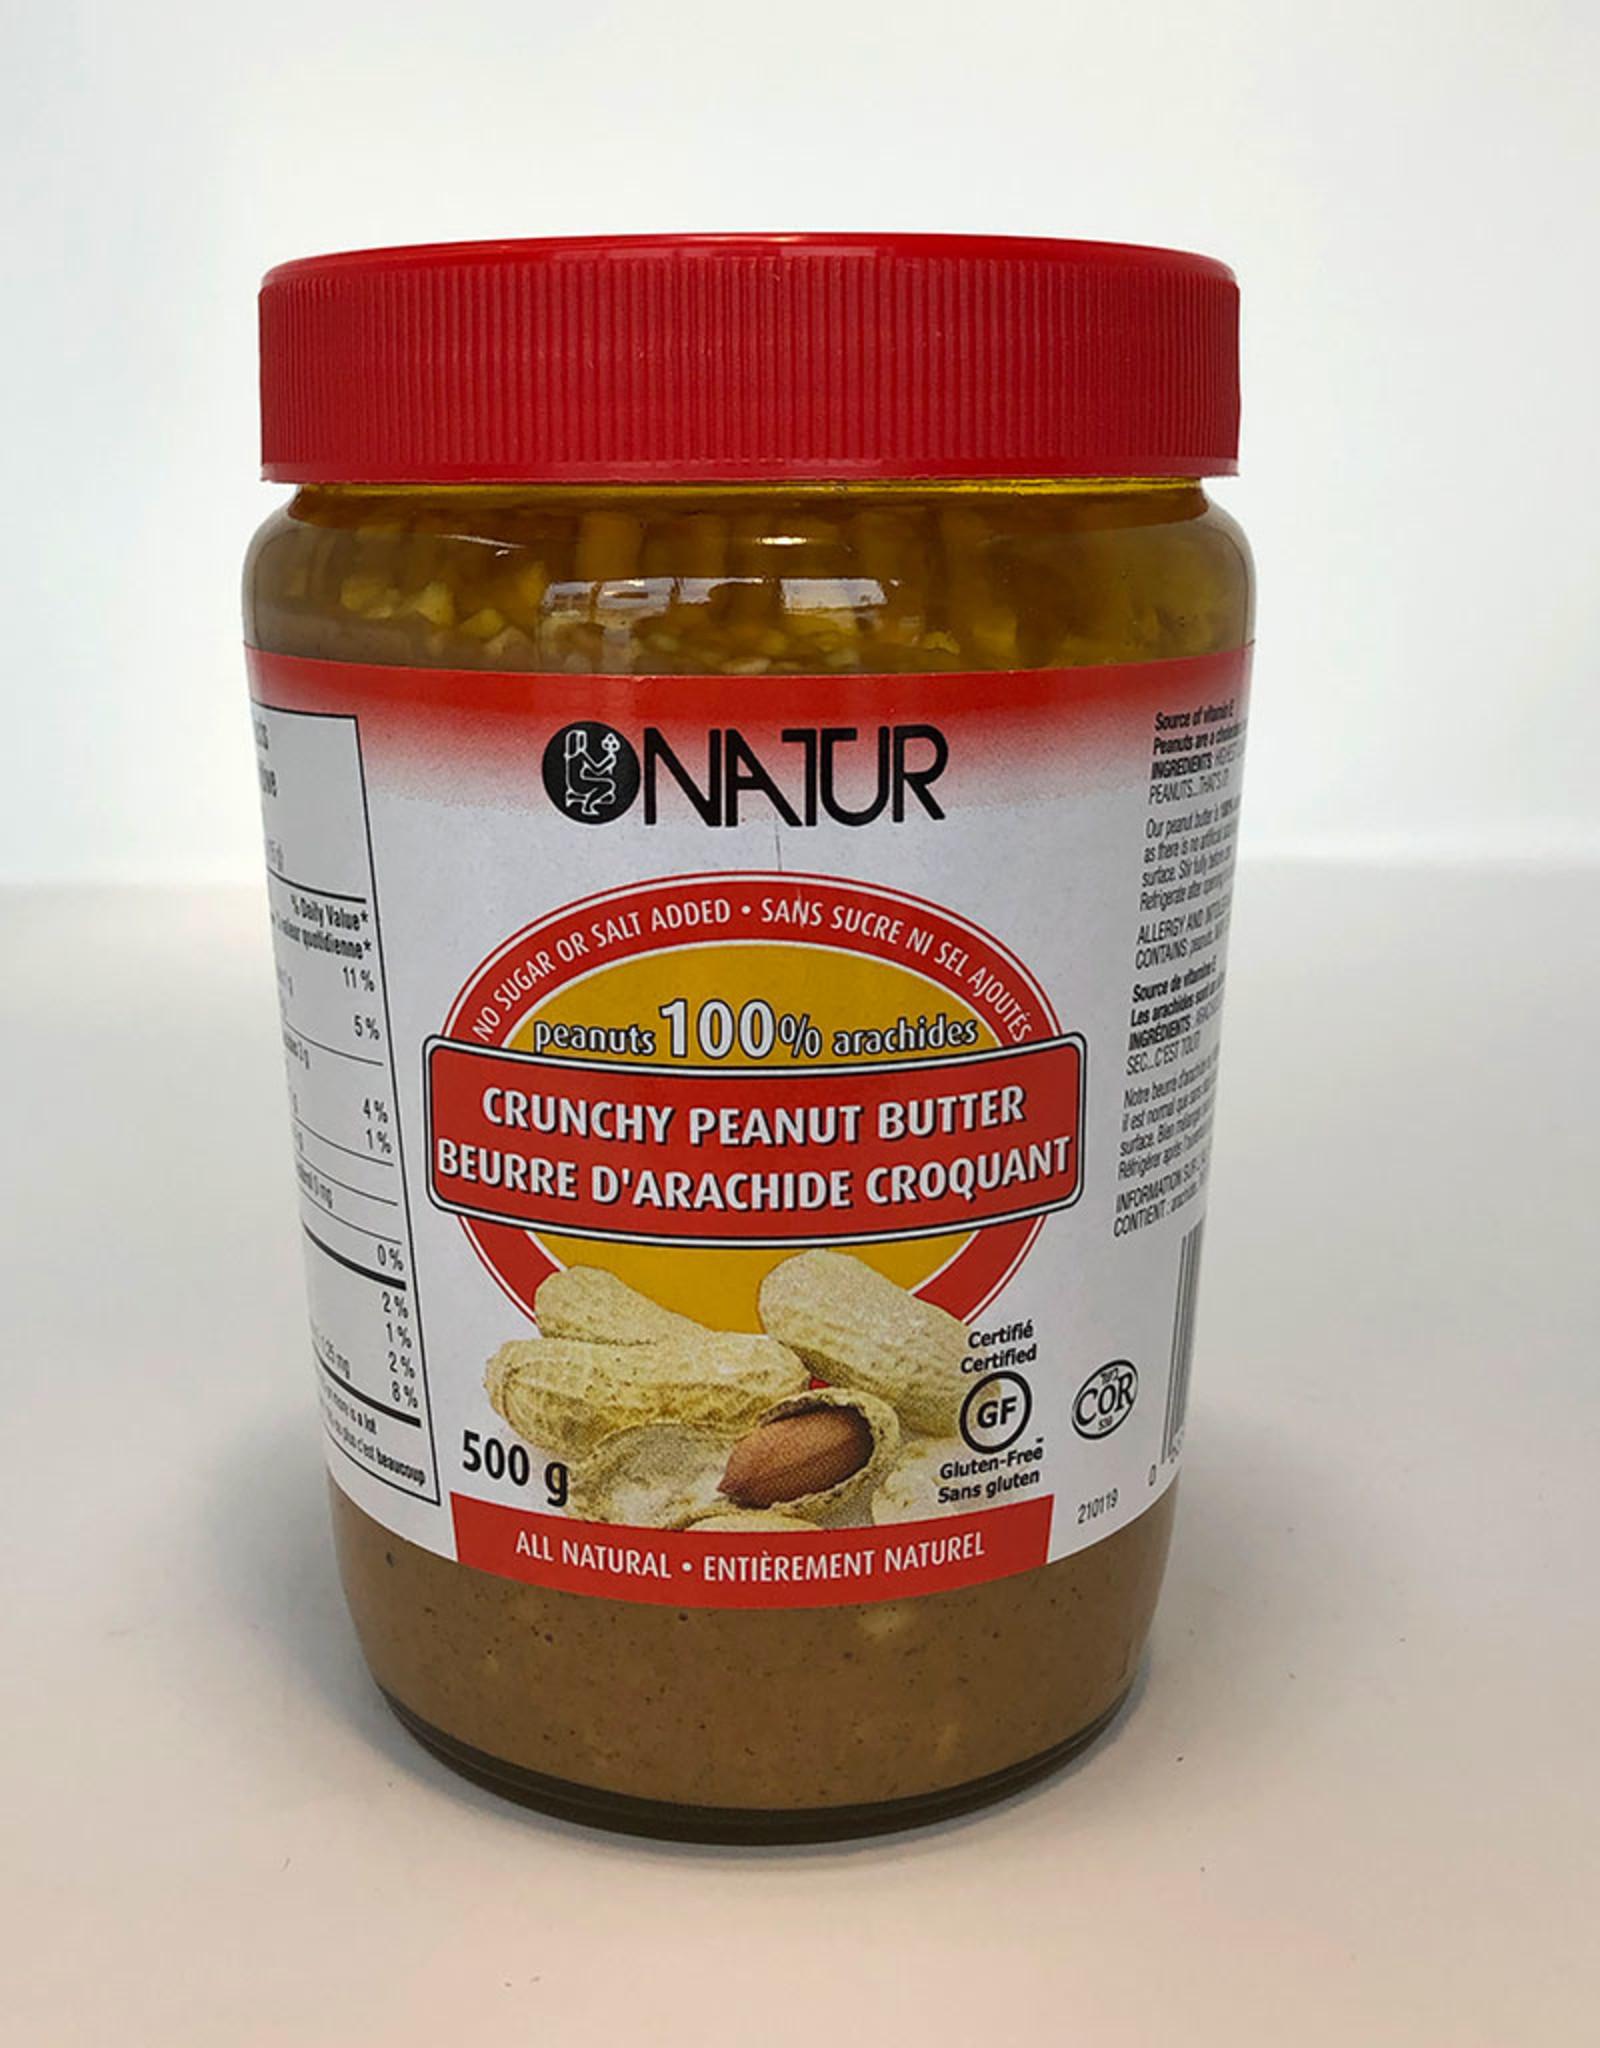 Natur Natur - Peanut Butter, Crunchy (500g)